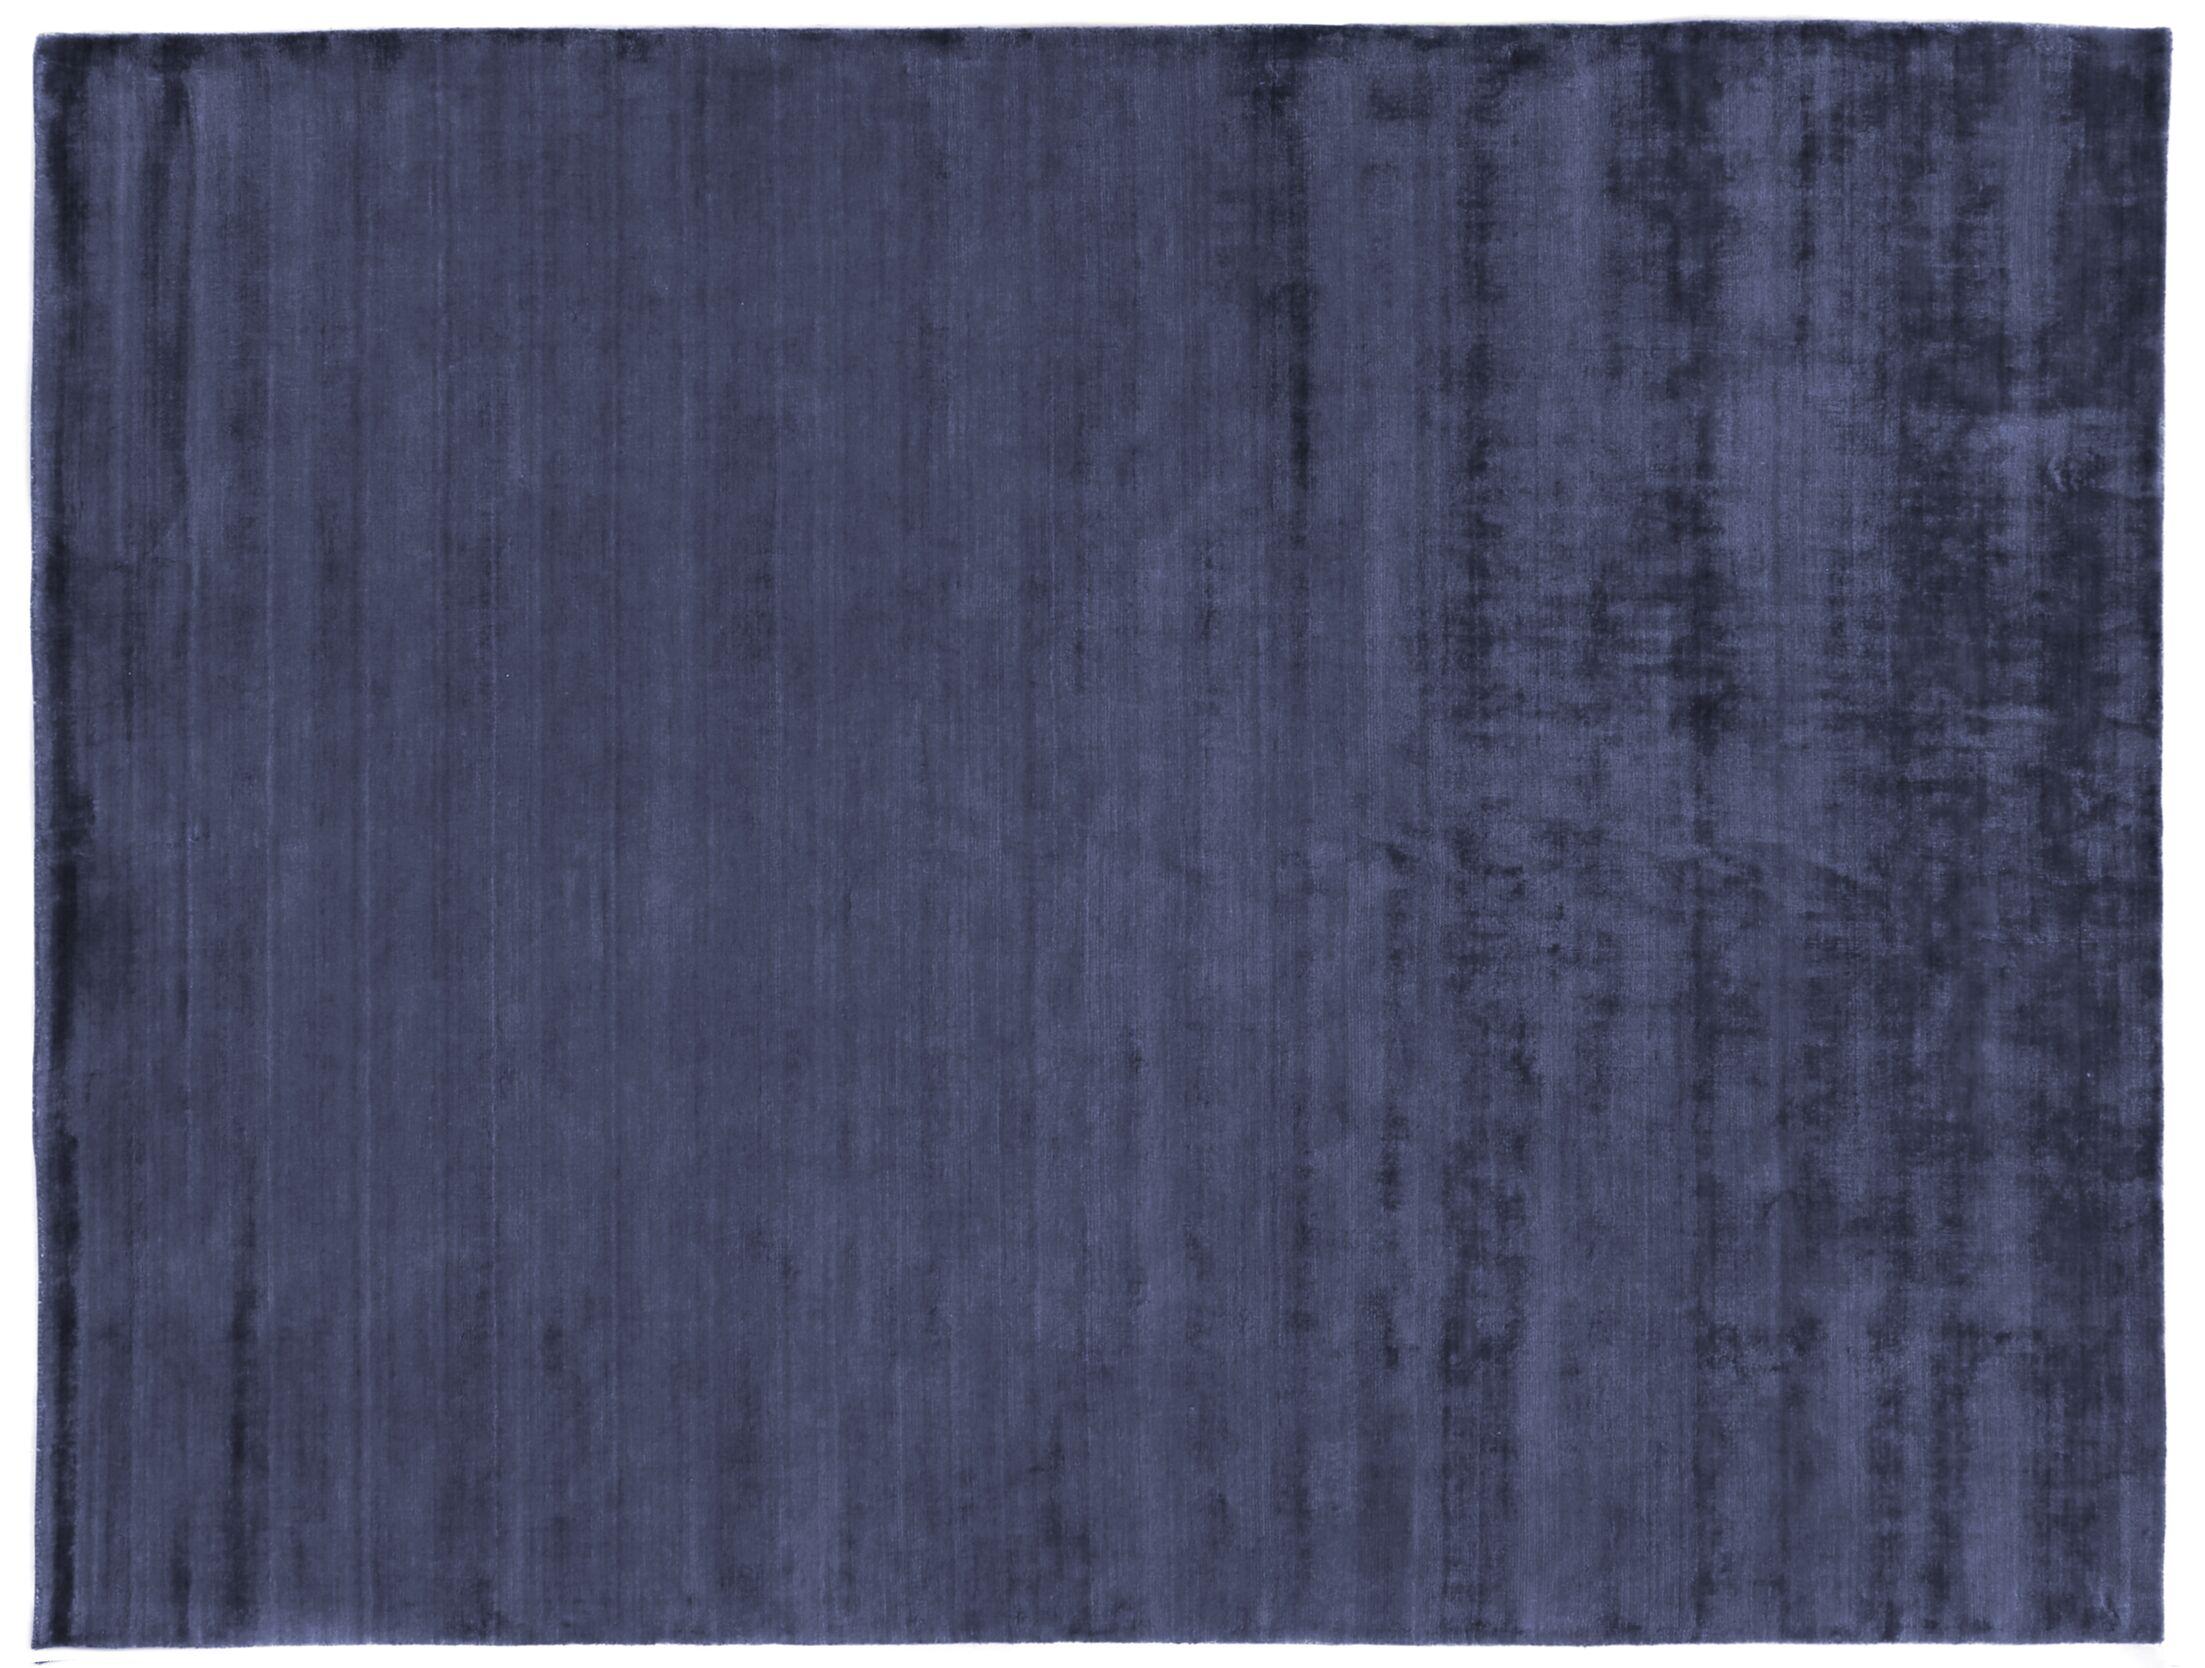 Purity Hand-Woven Silk Dark Blue Area Rug Rug Size: Rectangle 9' x 12'